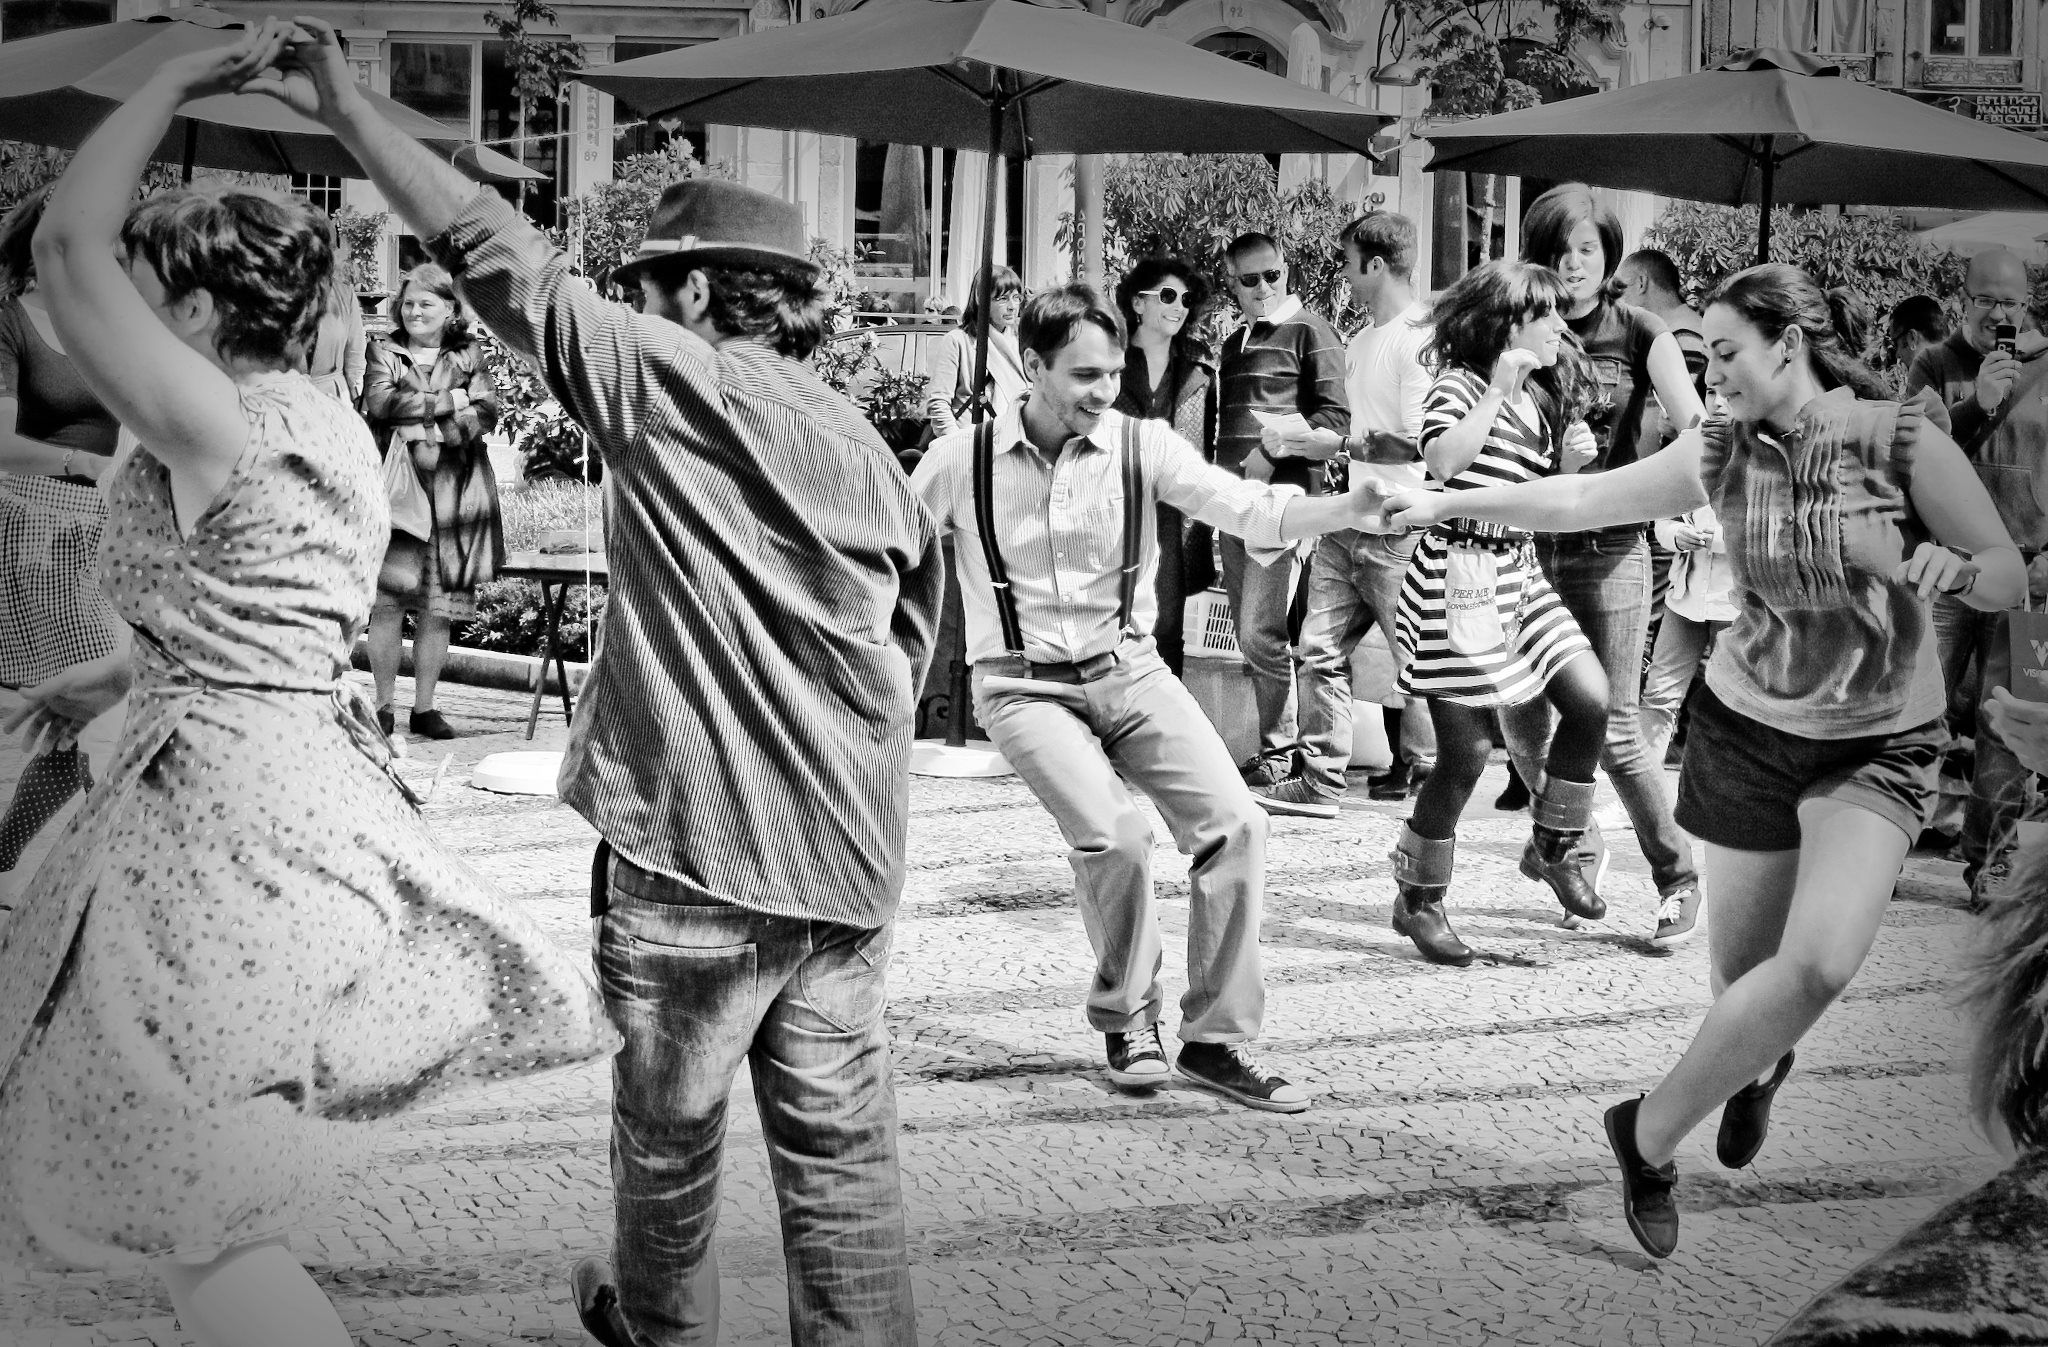 молодежь практикует свинг